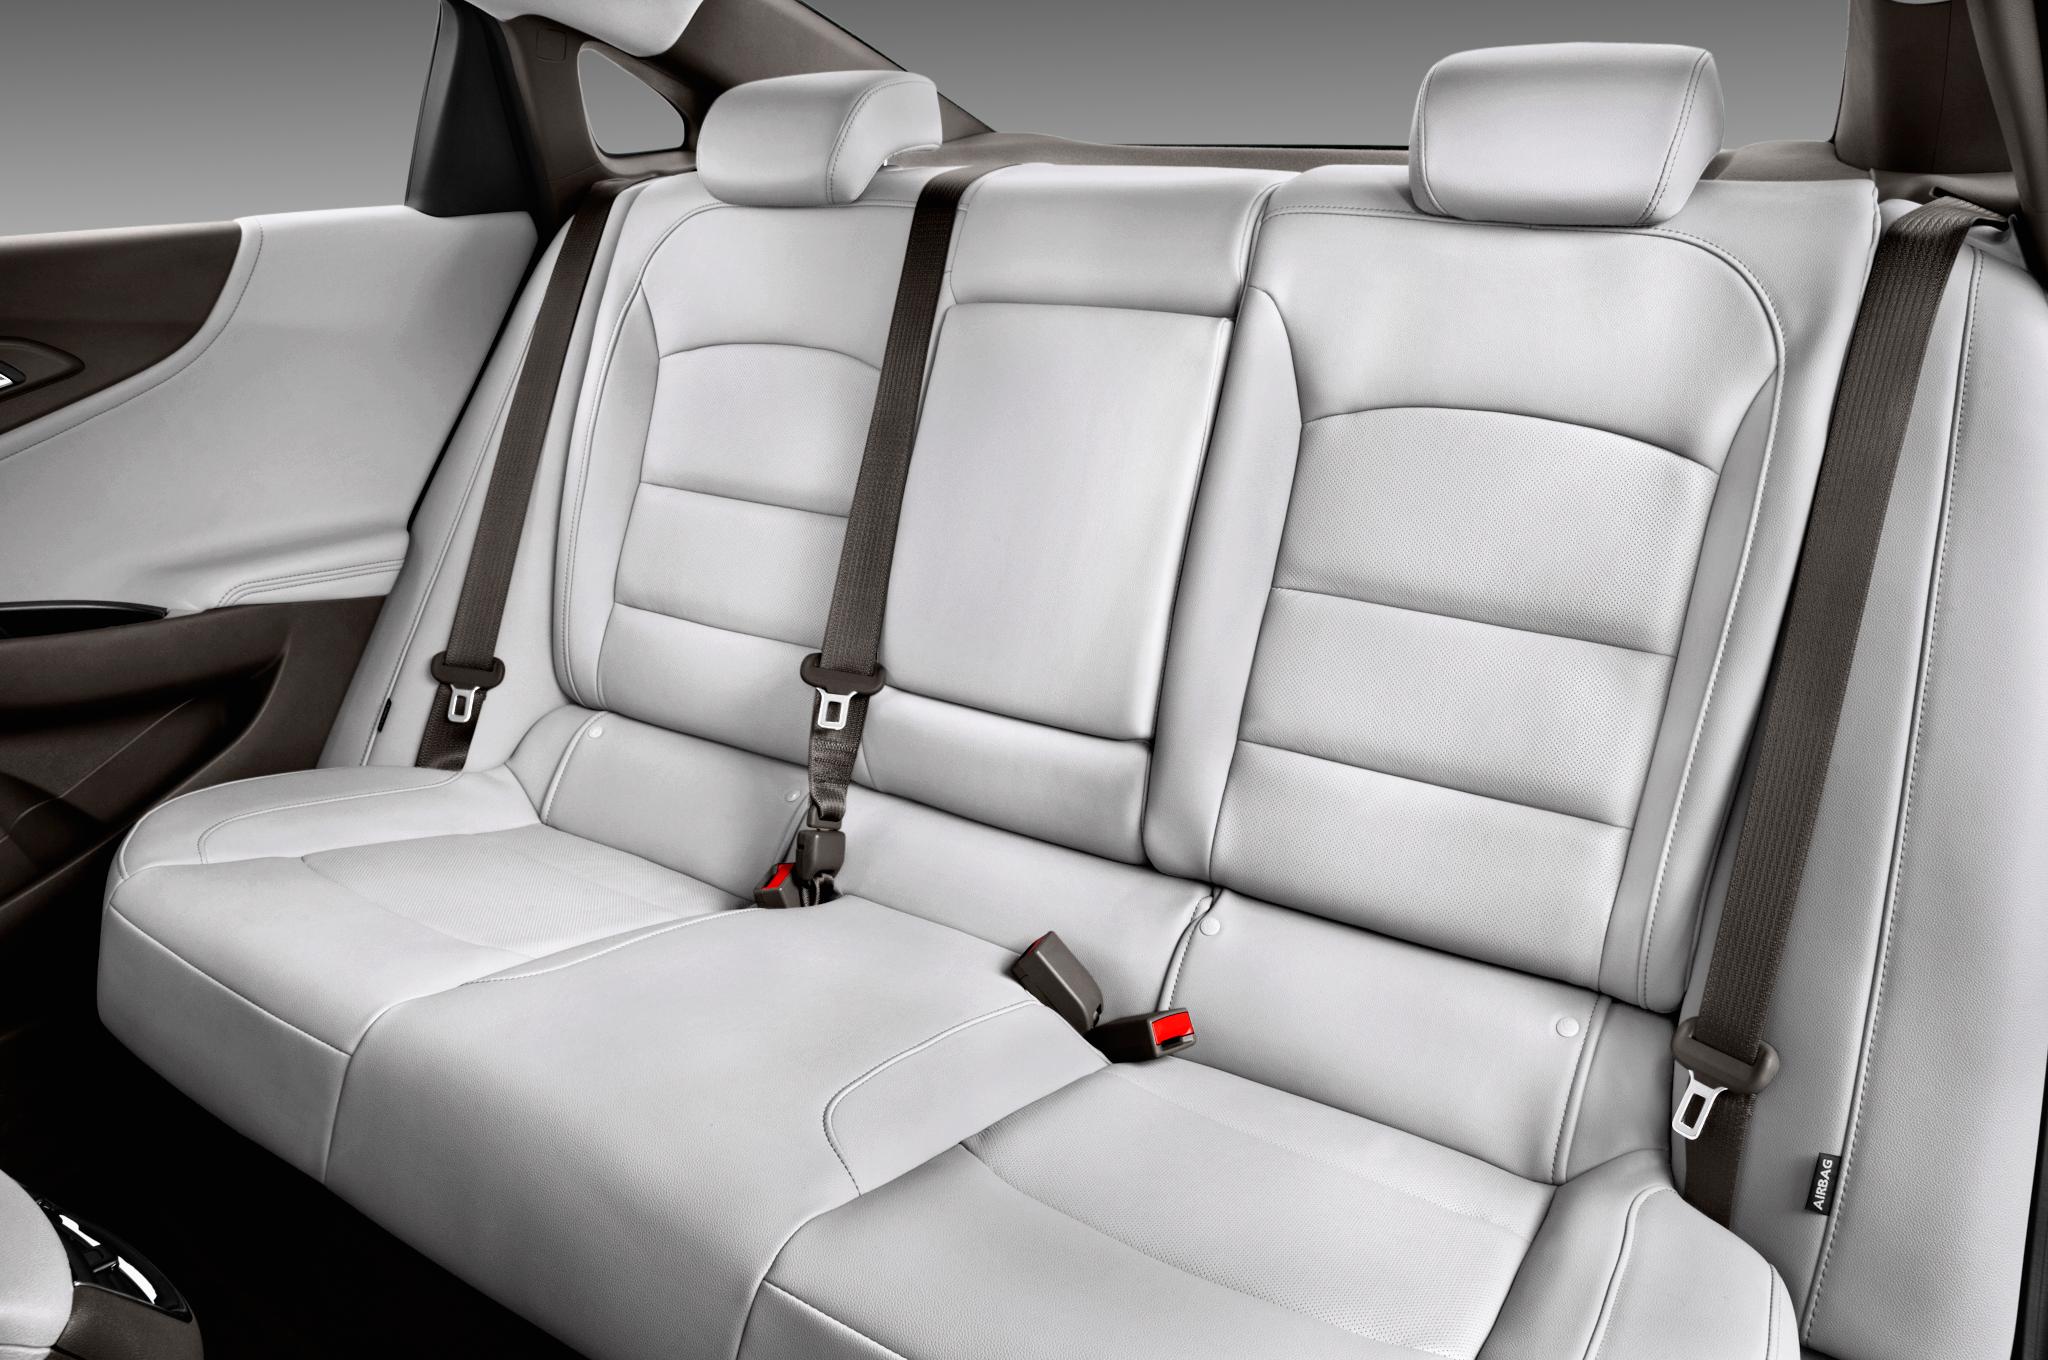 2016 Chevrolet Malibu Review